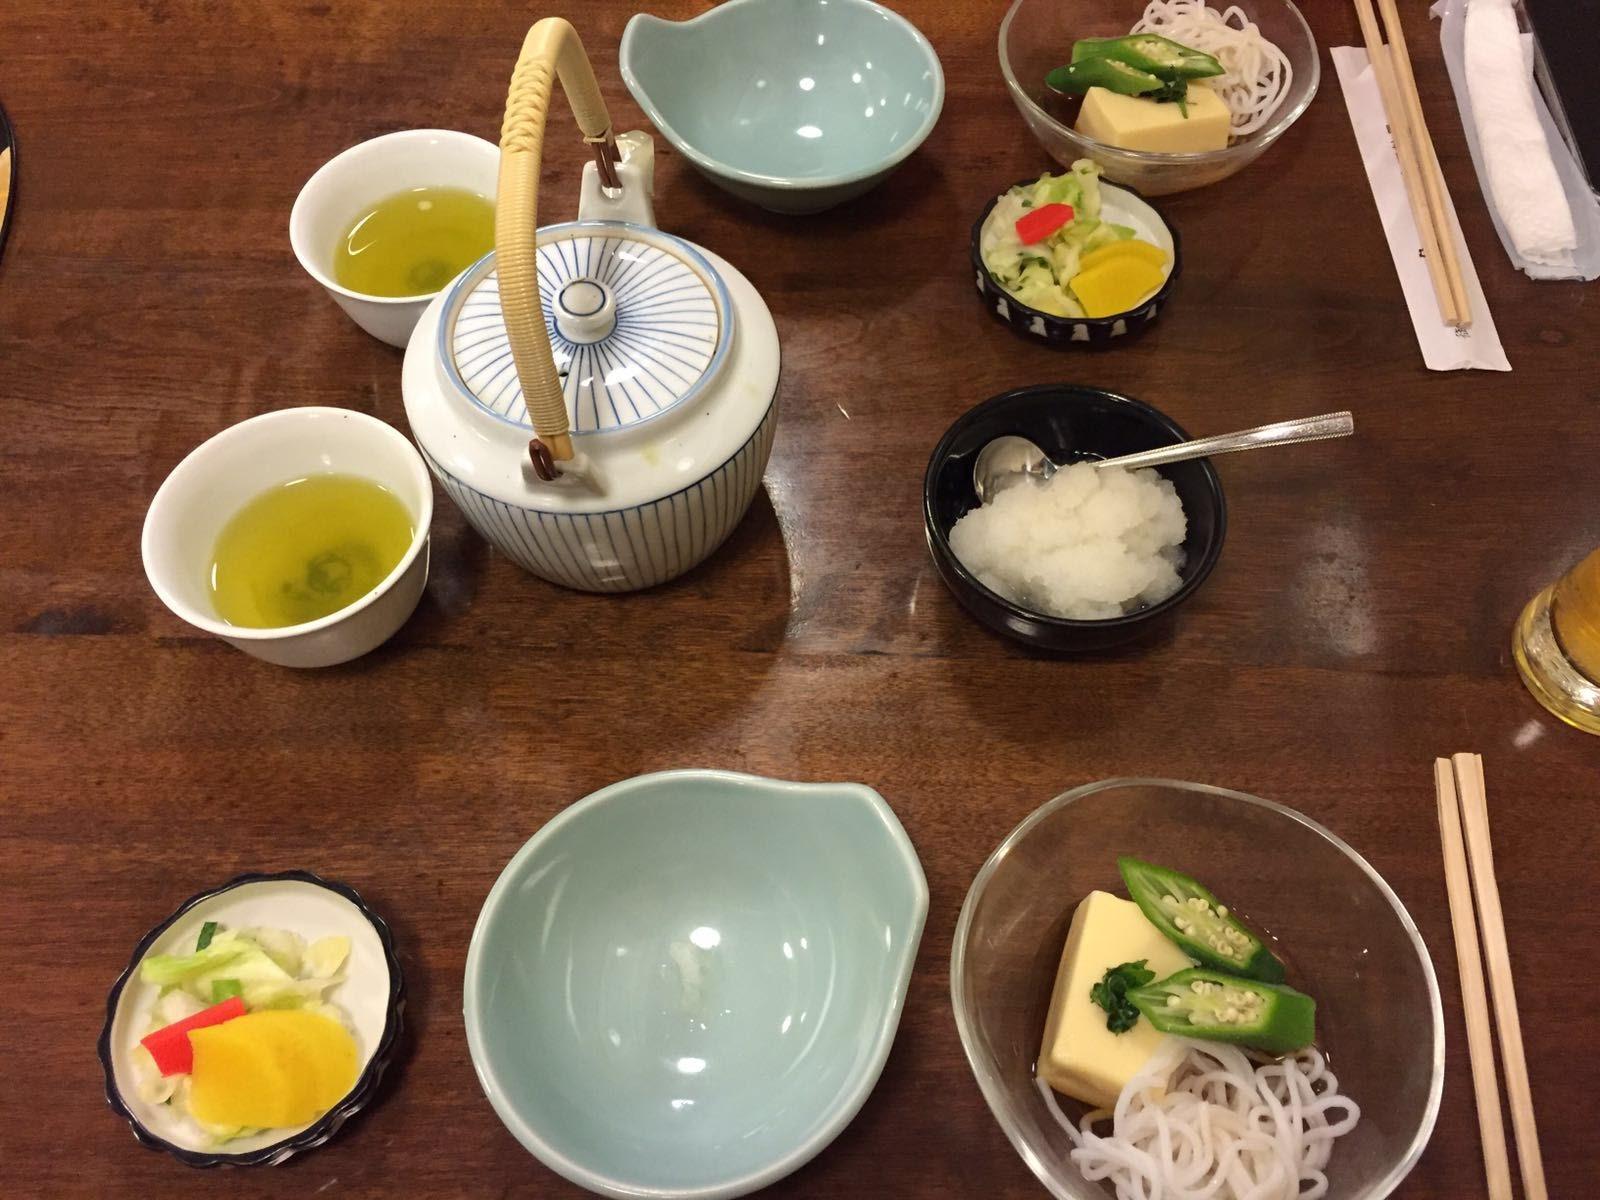 Dîner au Daikokuya